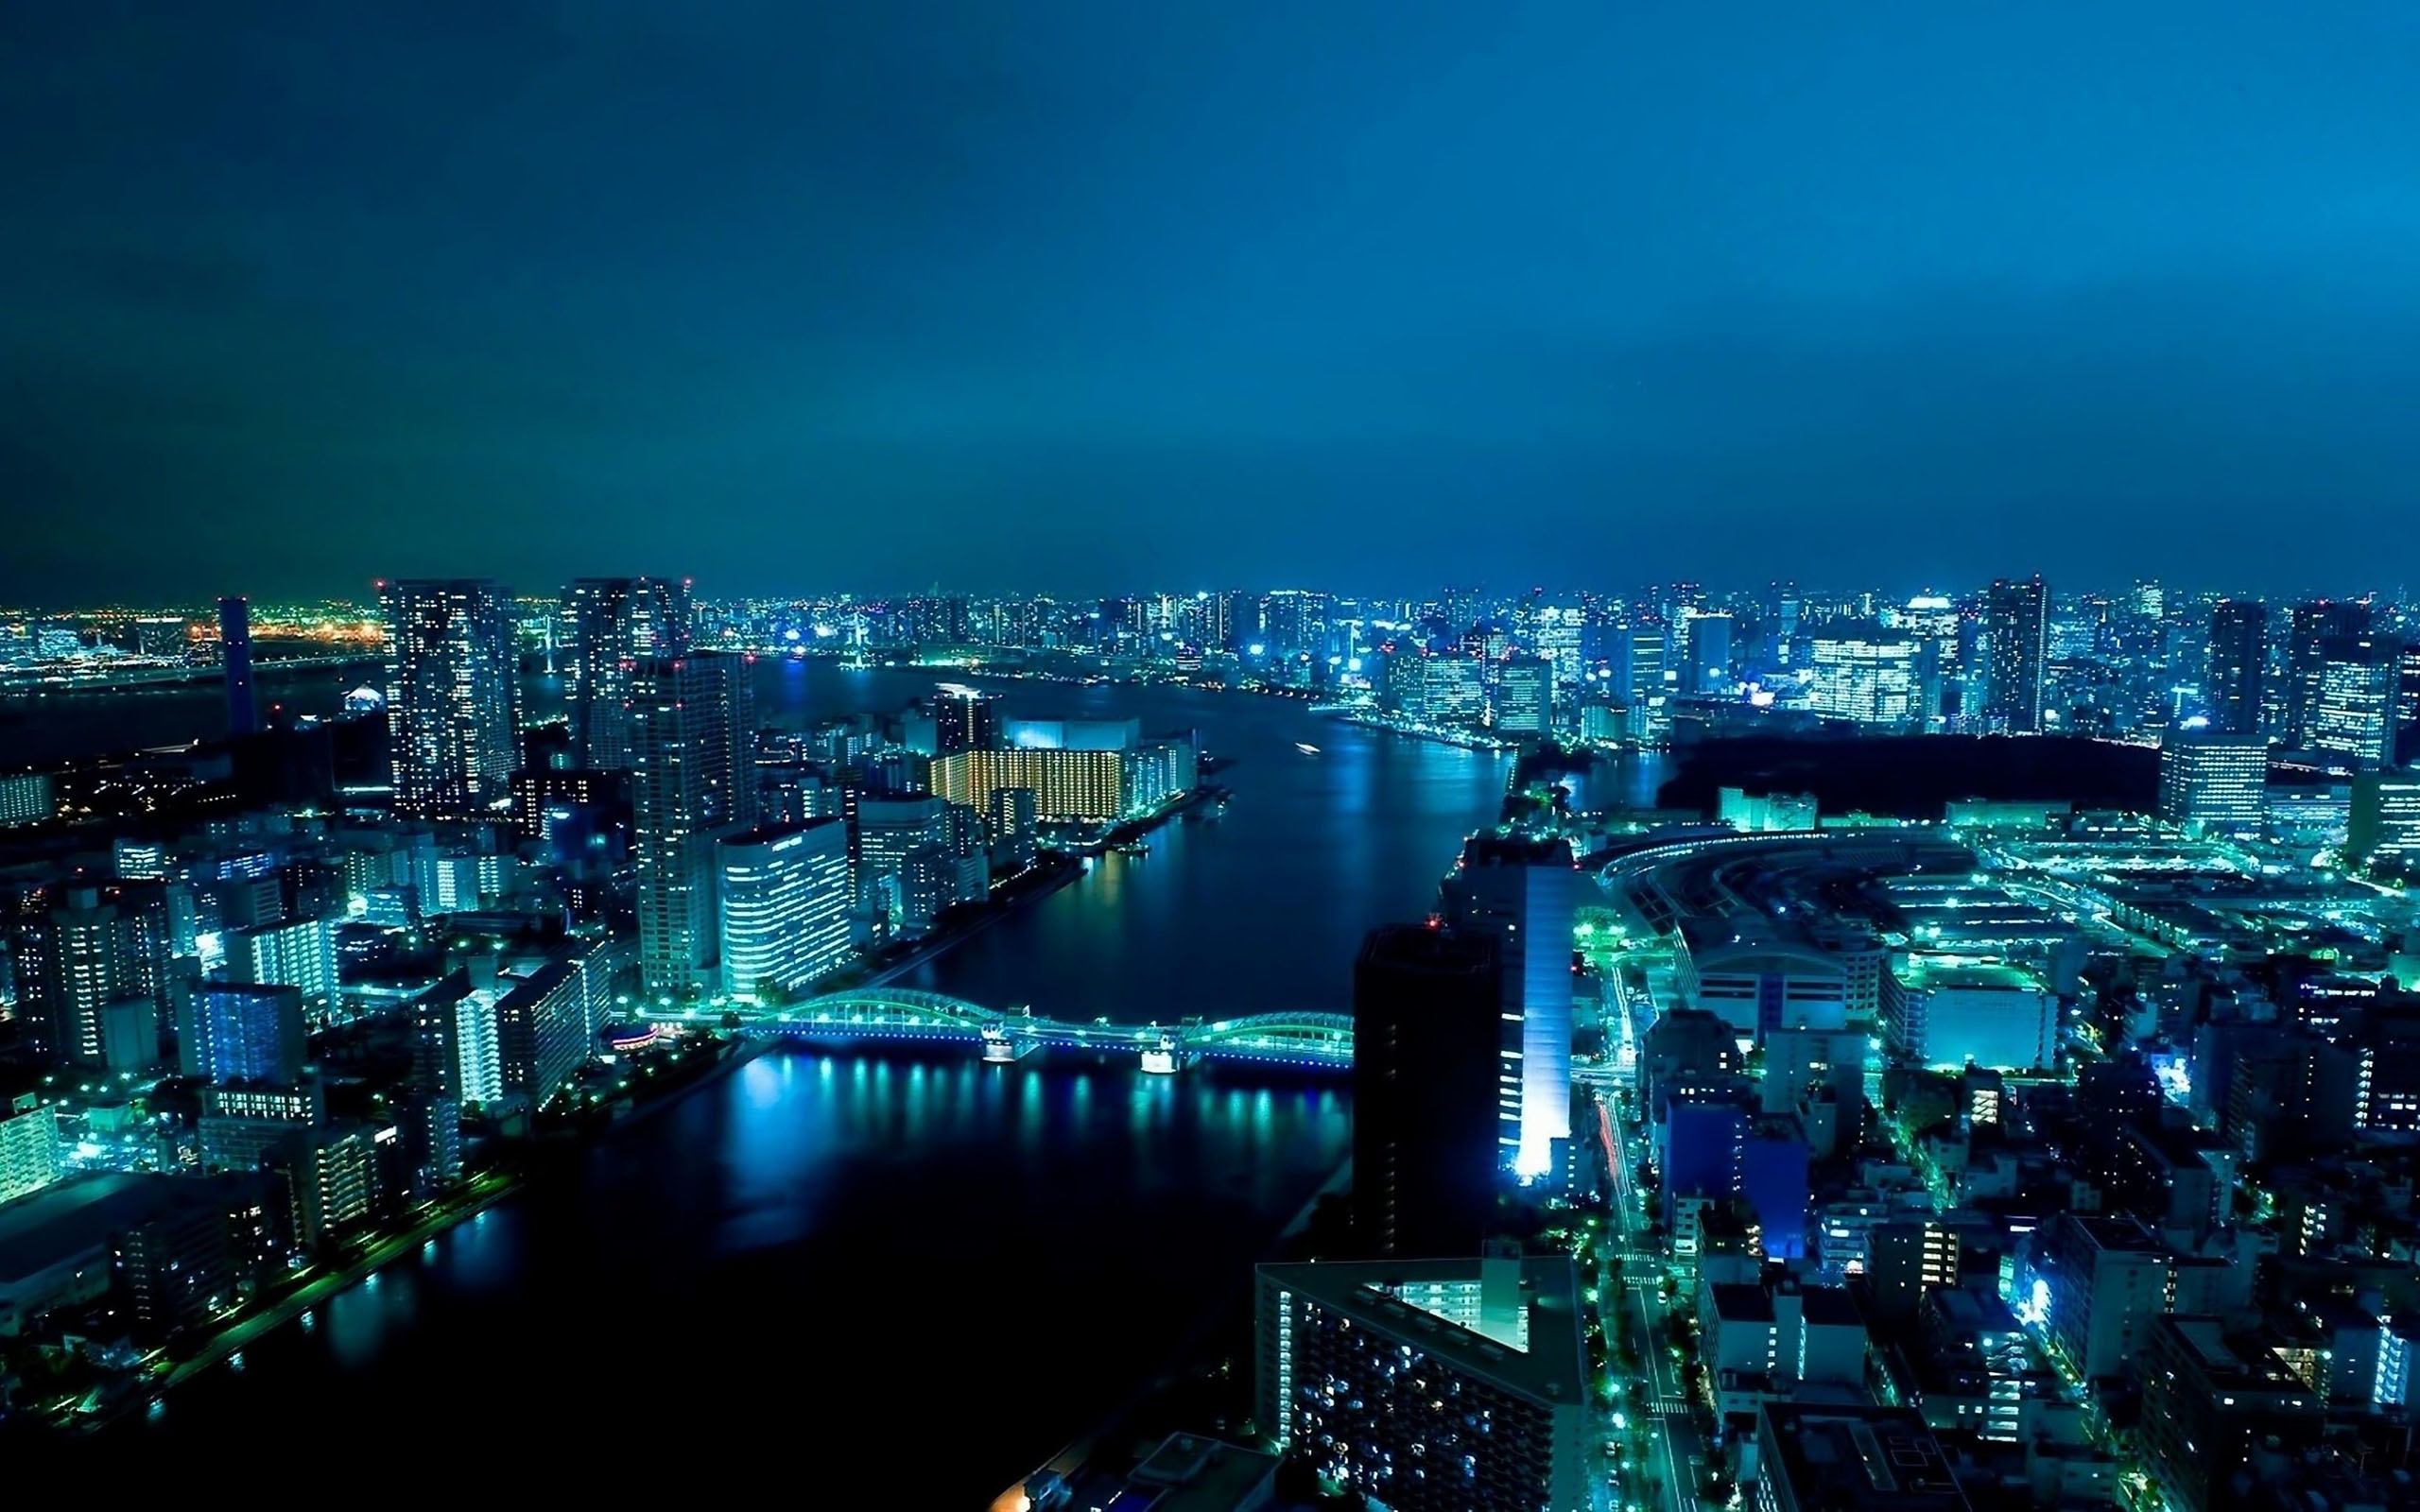 Tokyo's surprising lack of density